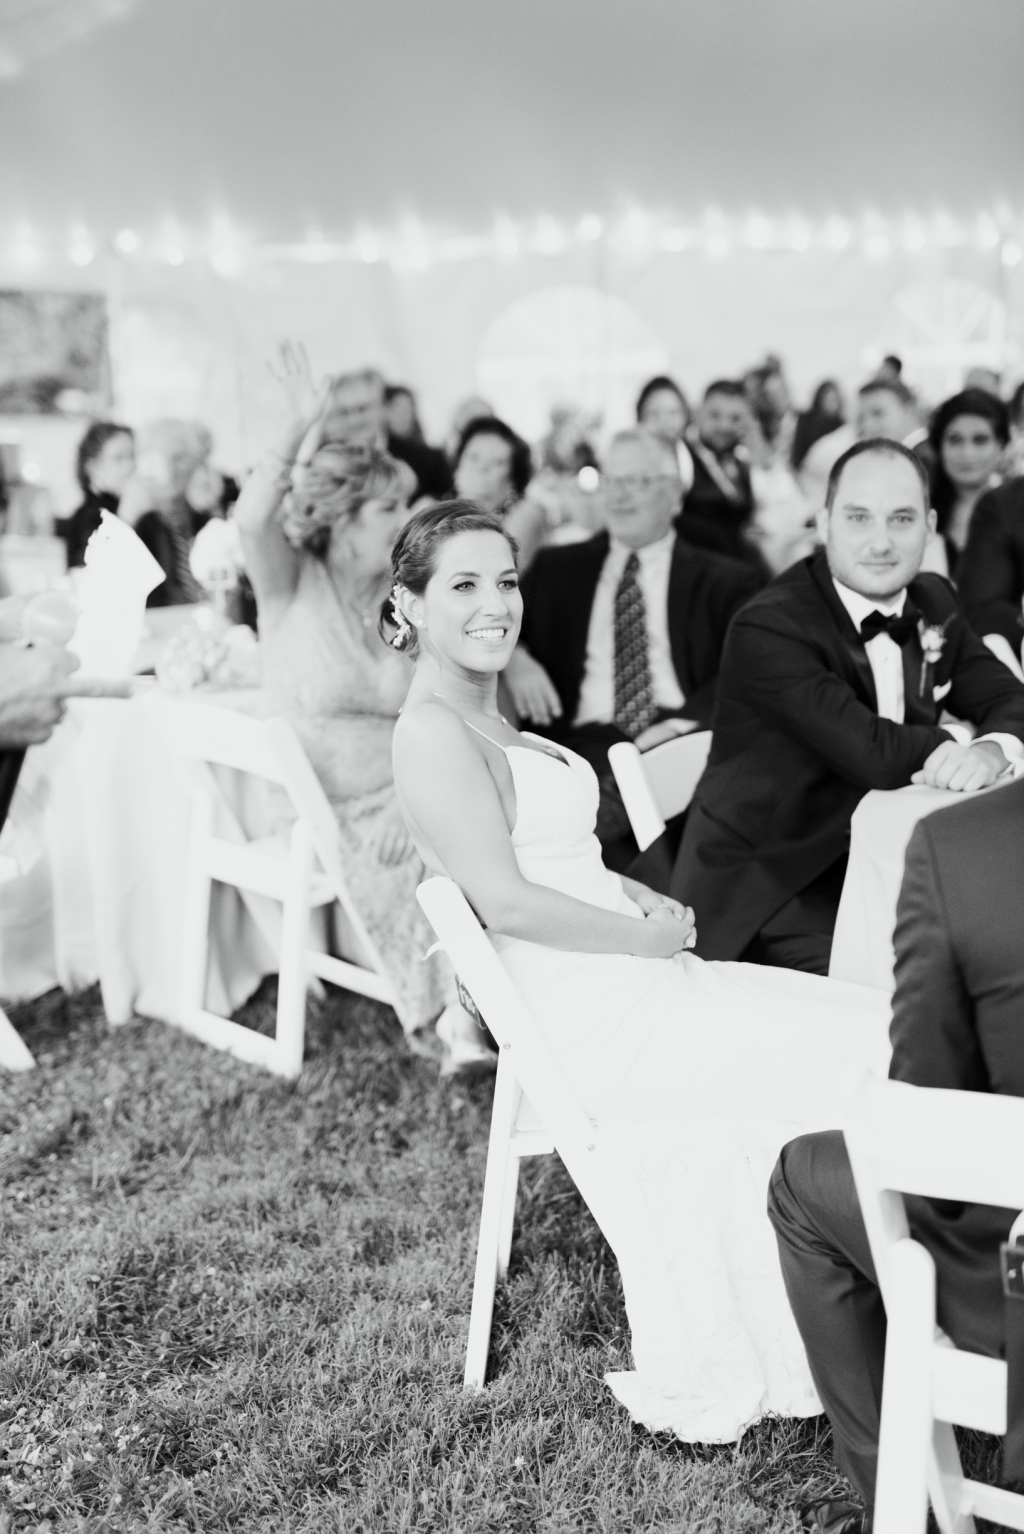 haley-richter-photography-buena-vista-confrence-center-wedding-summer-167